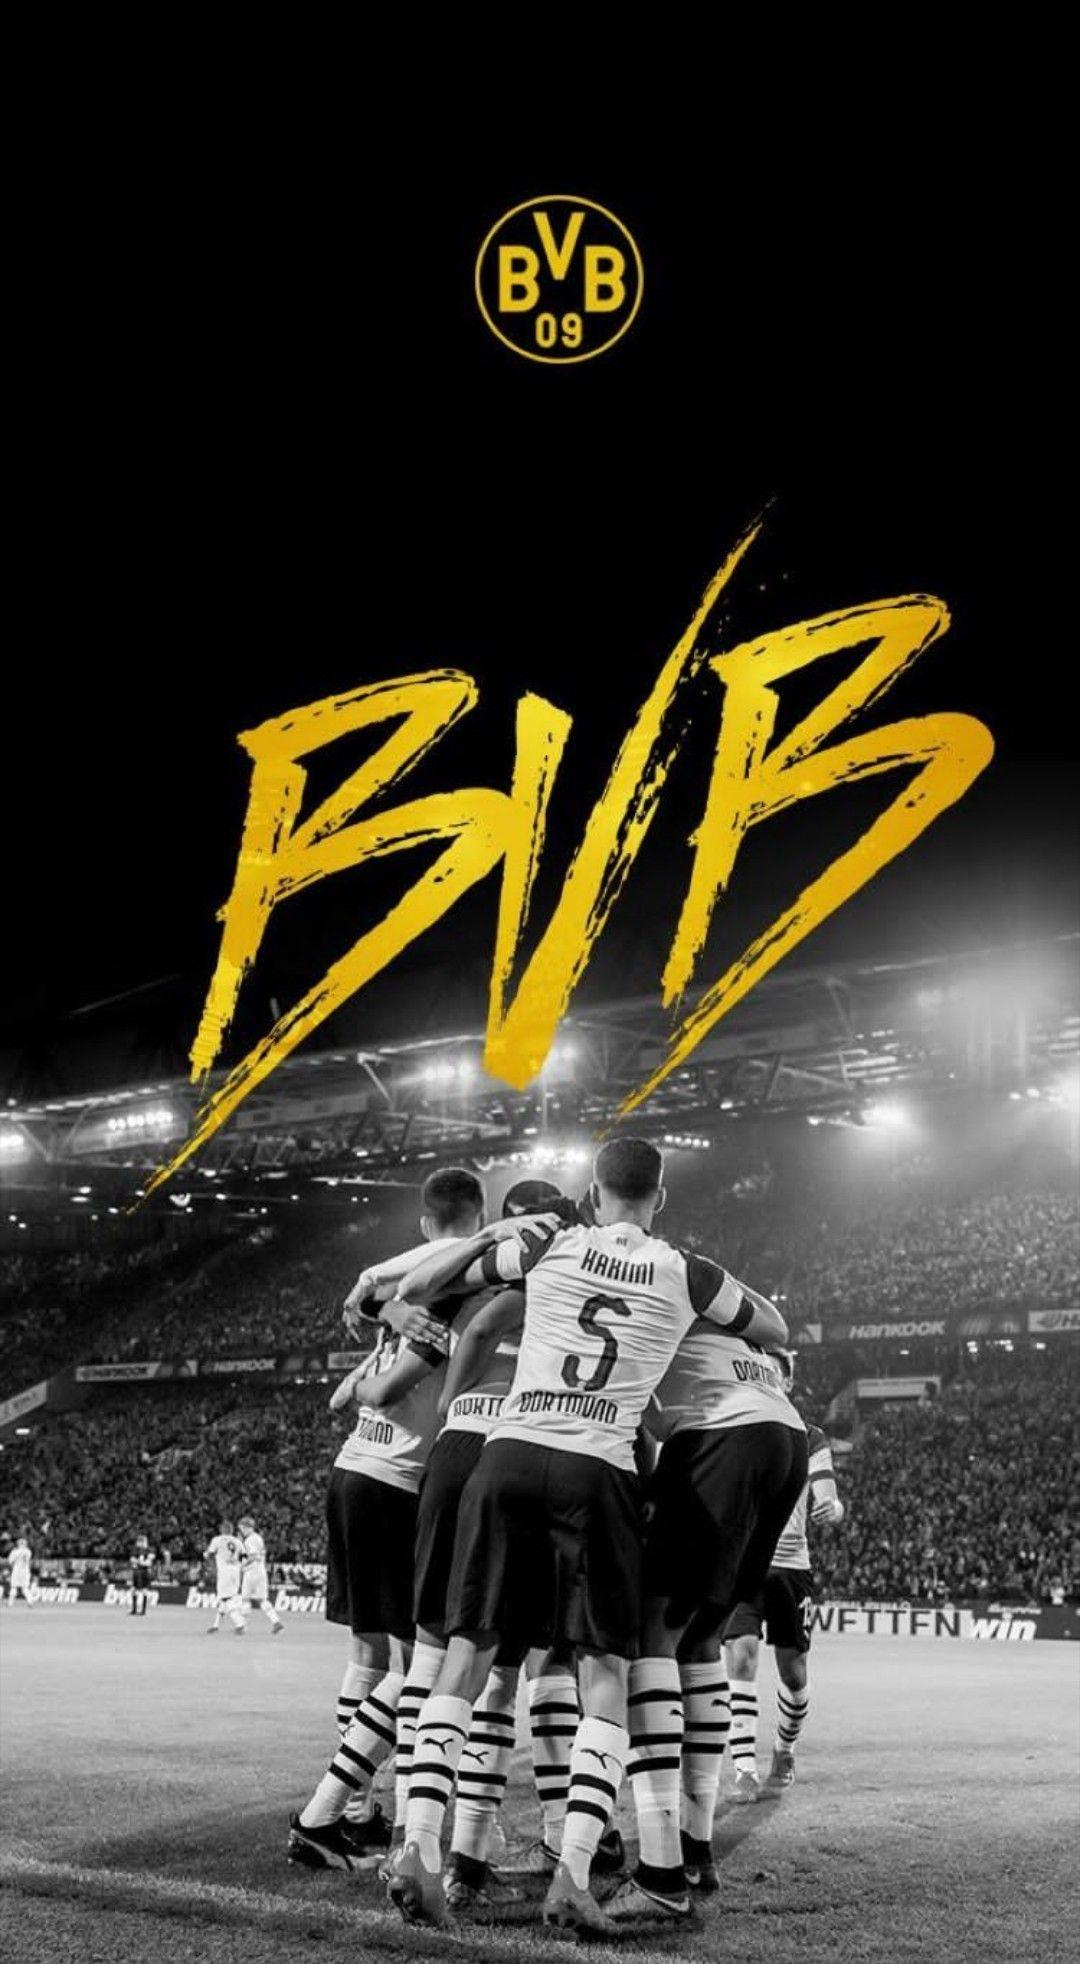 Borussia Dortmund ドルトムント サッカーの壁紙 サッカー選手 壁紙